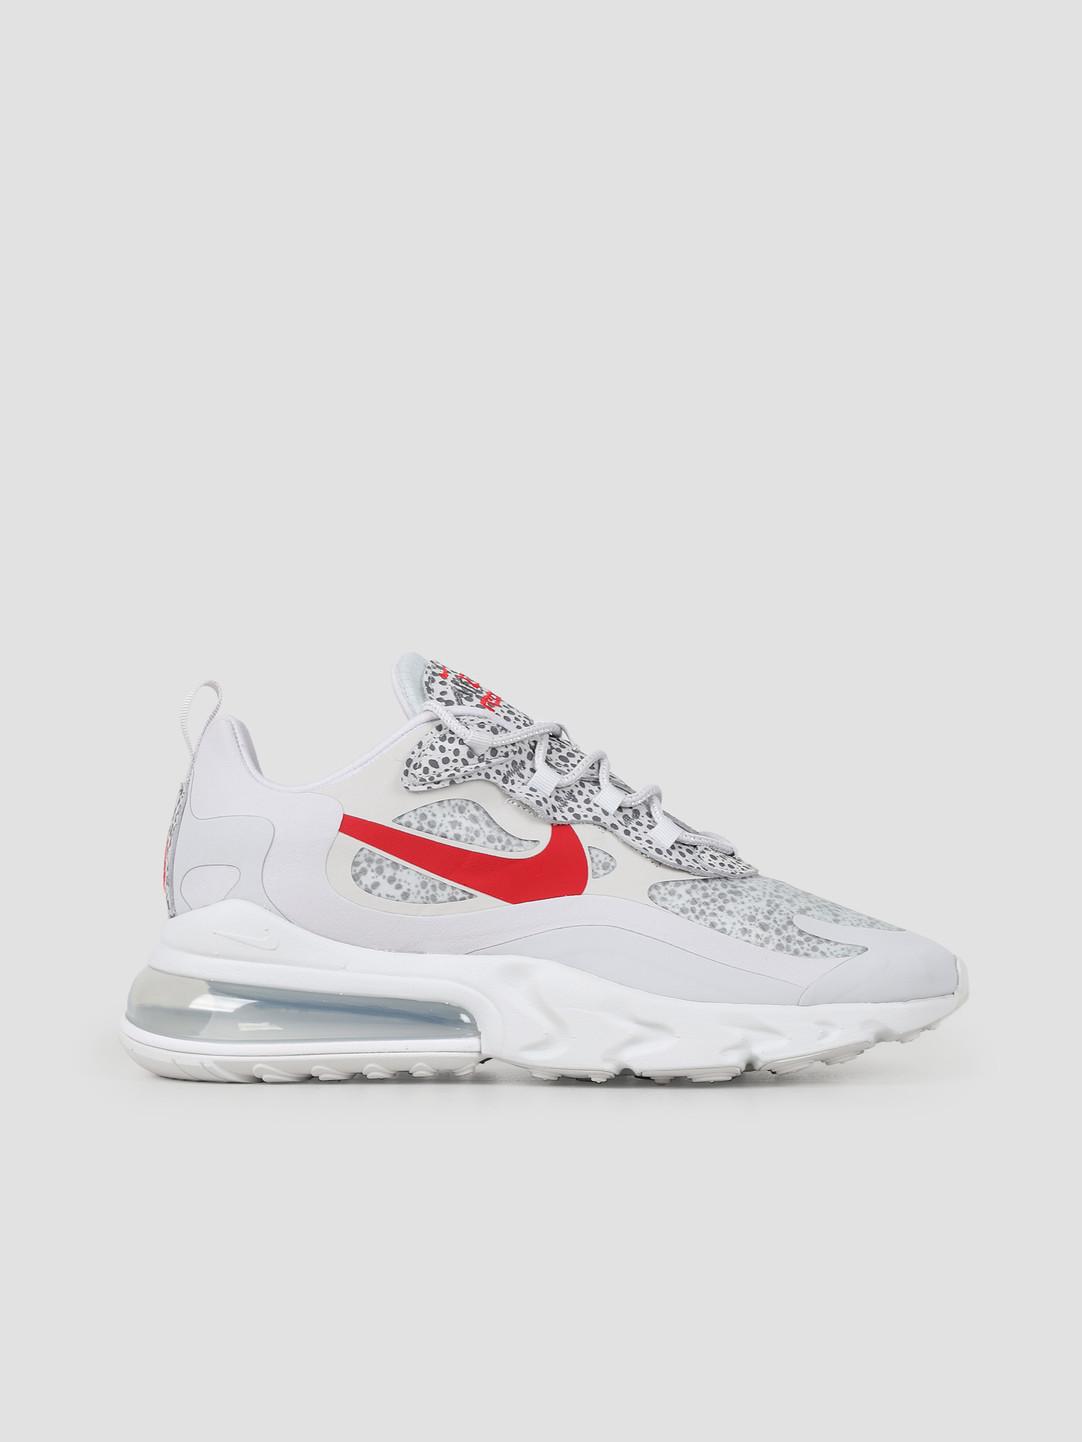 Nike Nike Air Max 270 React Neutral Grey University Red Lt Graphite CT2535 001